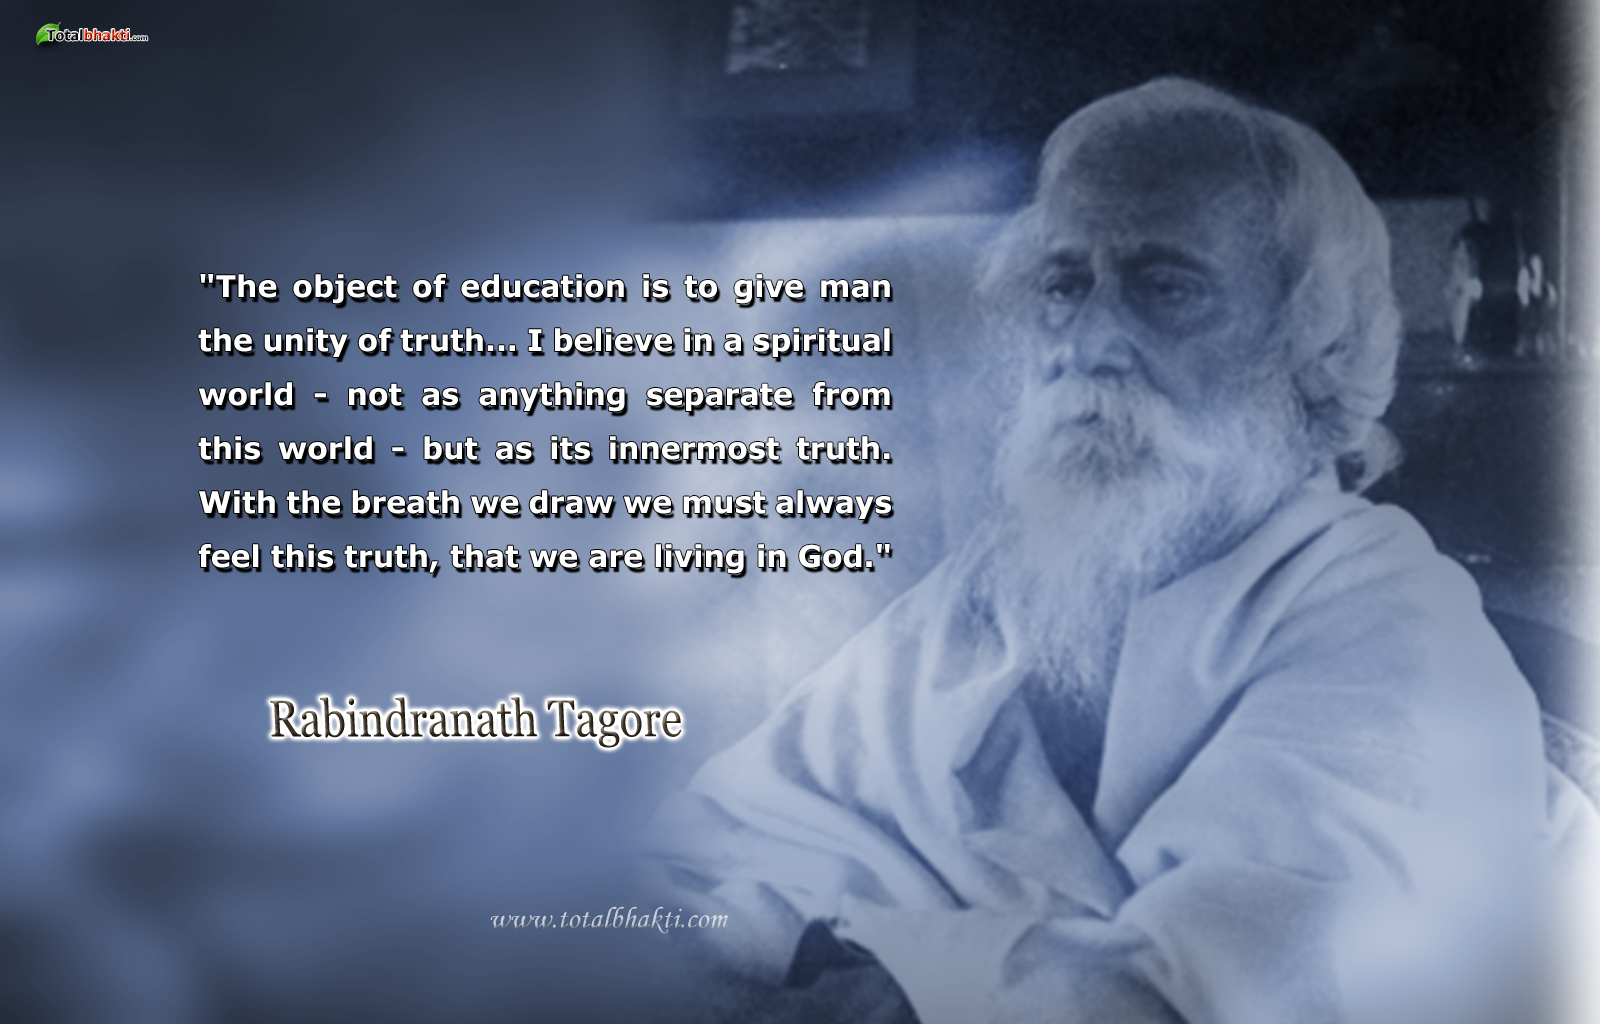 rabindranath tagore quotes quotesgram